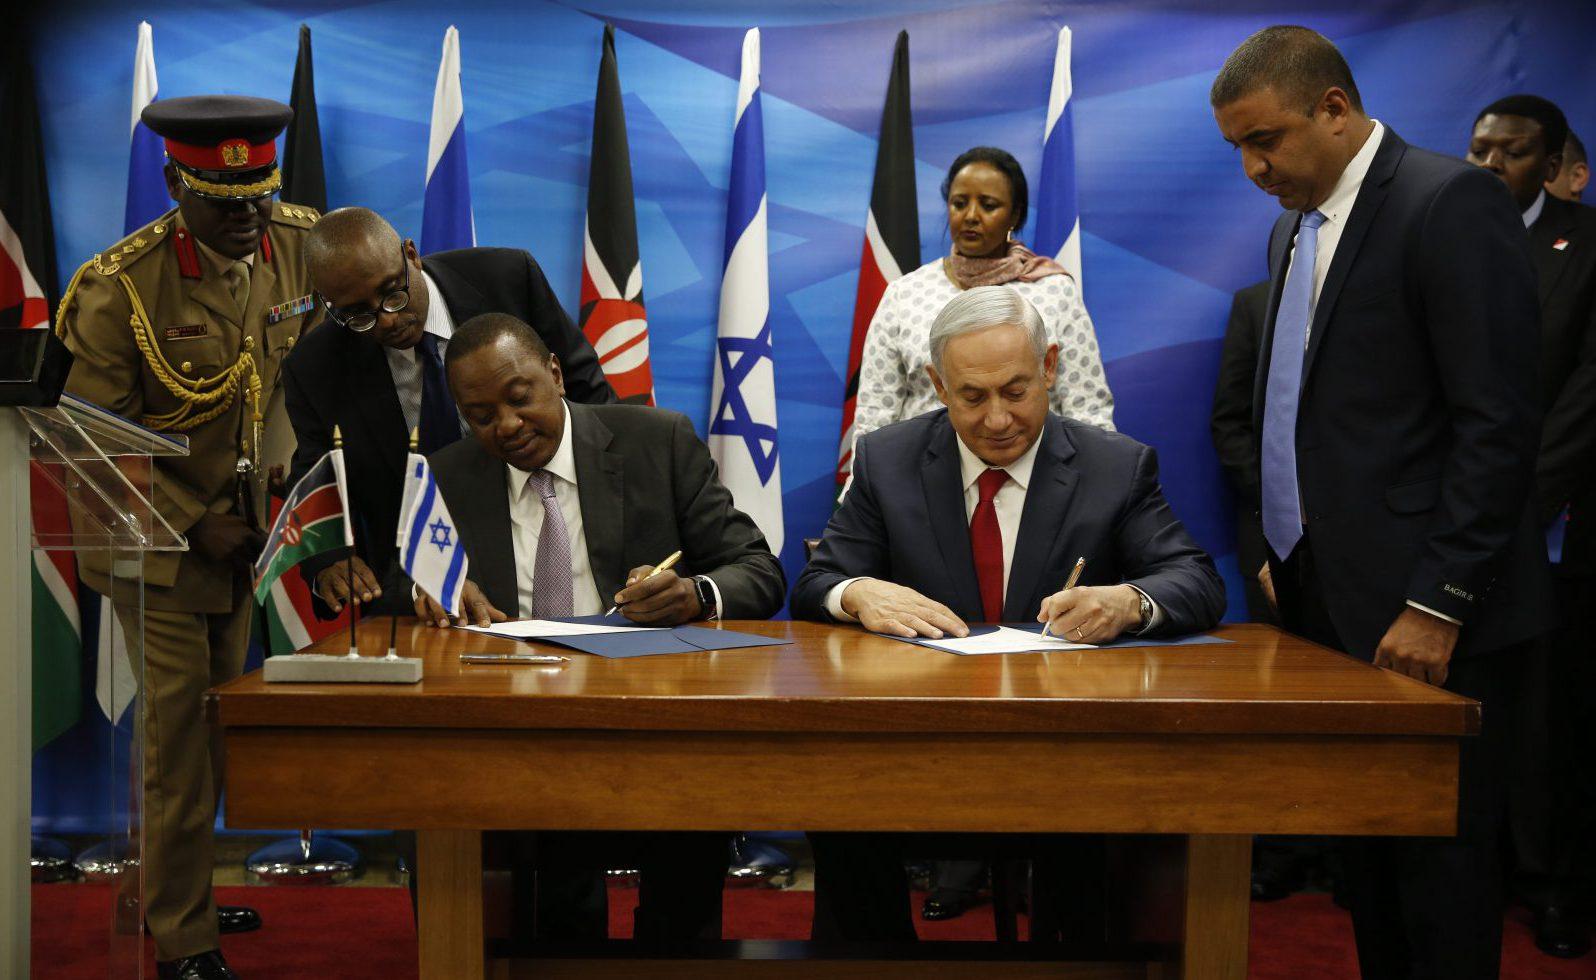 Uhuru Kenyetta and Benjamin Netanyahu